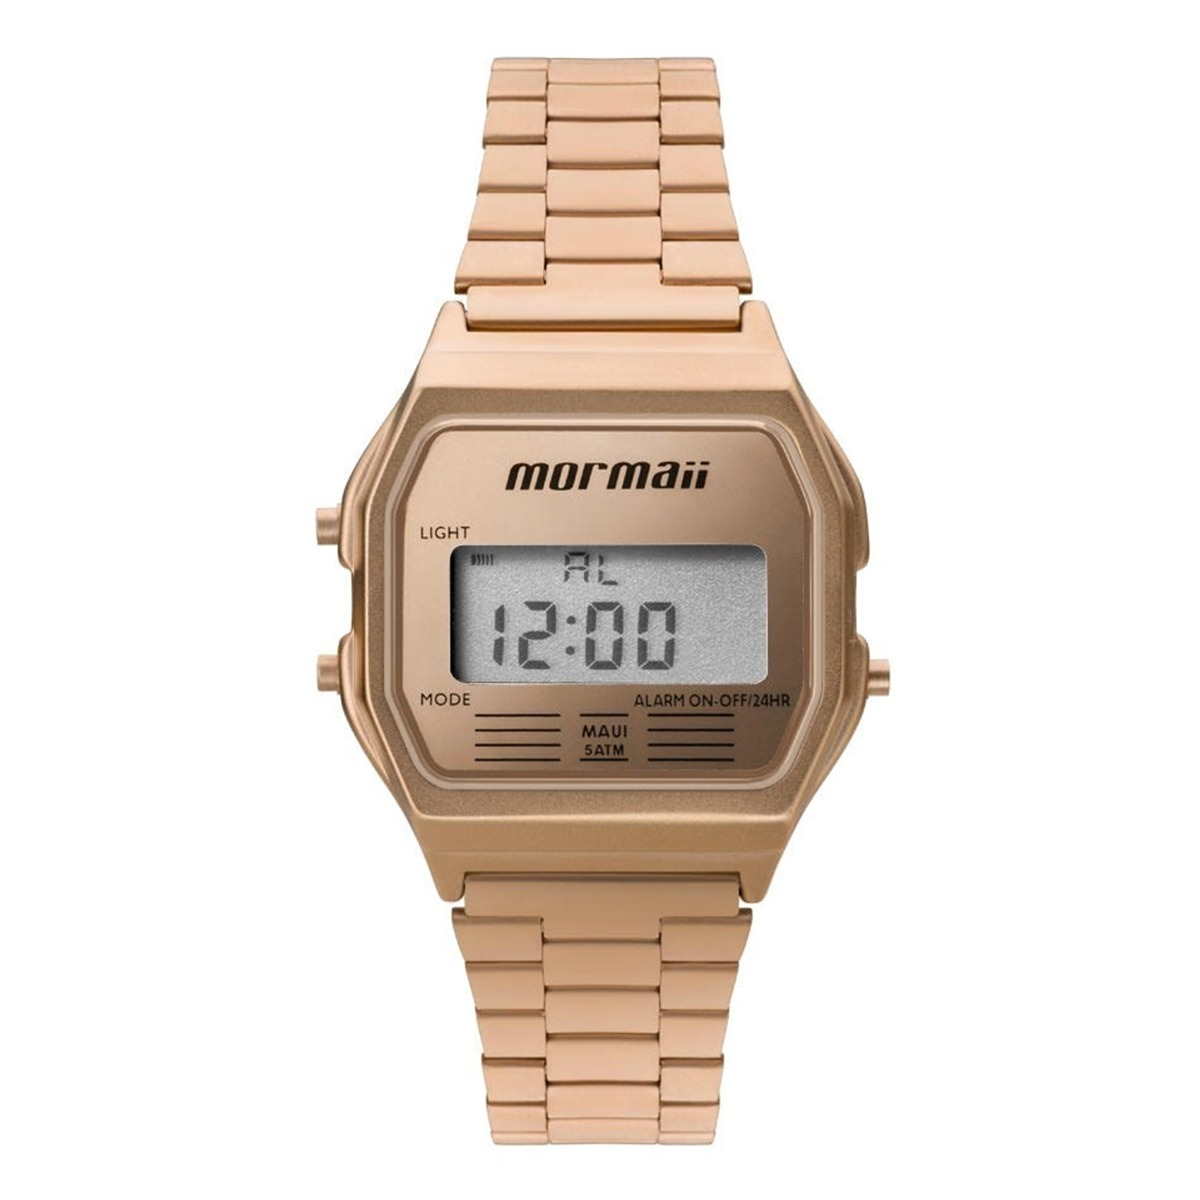 9cbd3a2afbd5f Relógio Mormaii Unissex Vintage Rosé Digital Mojh02ai 4j - R  283,40 ...